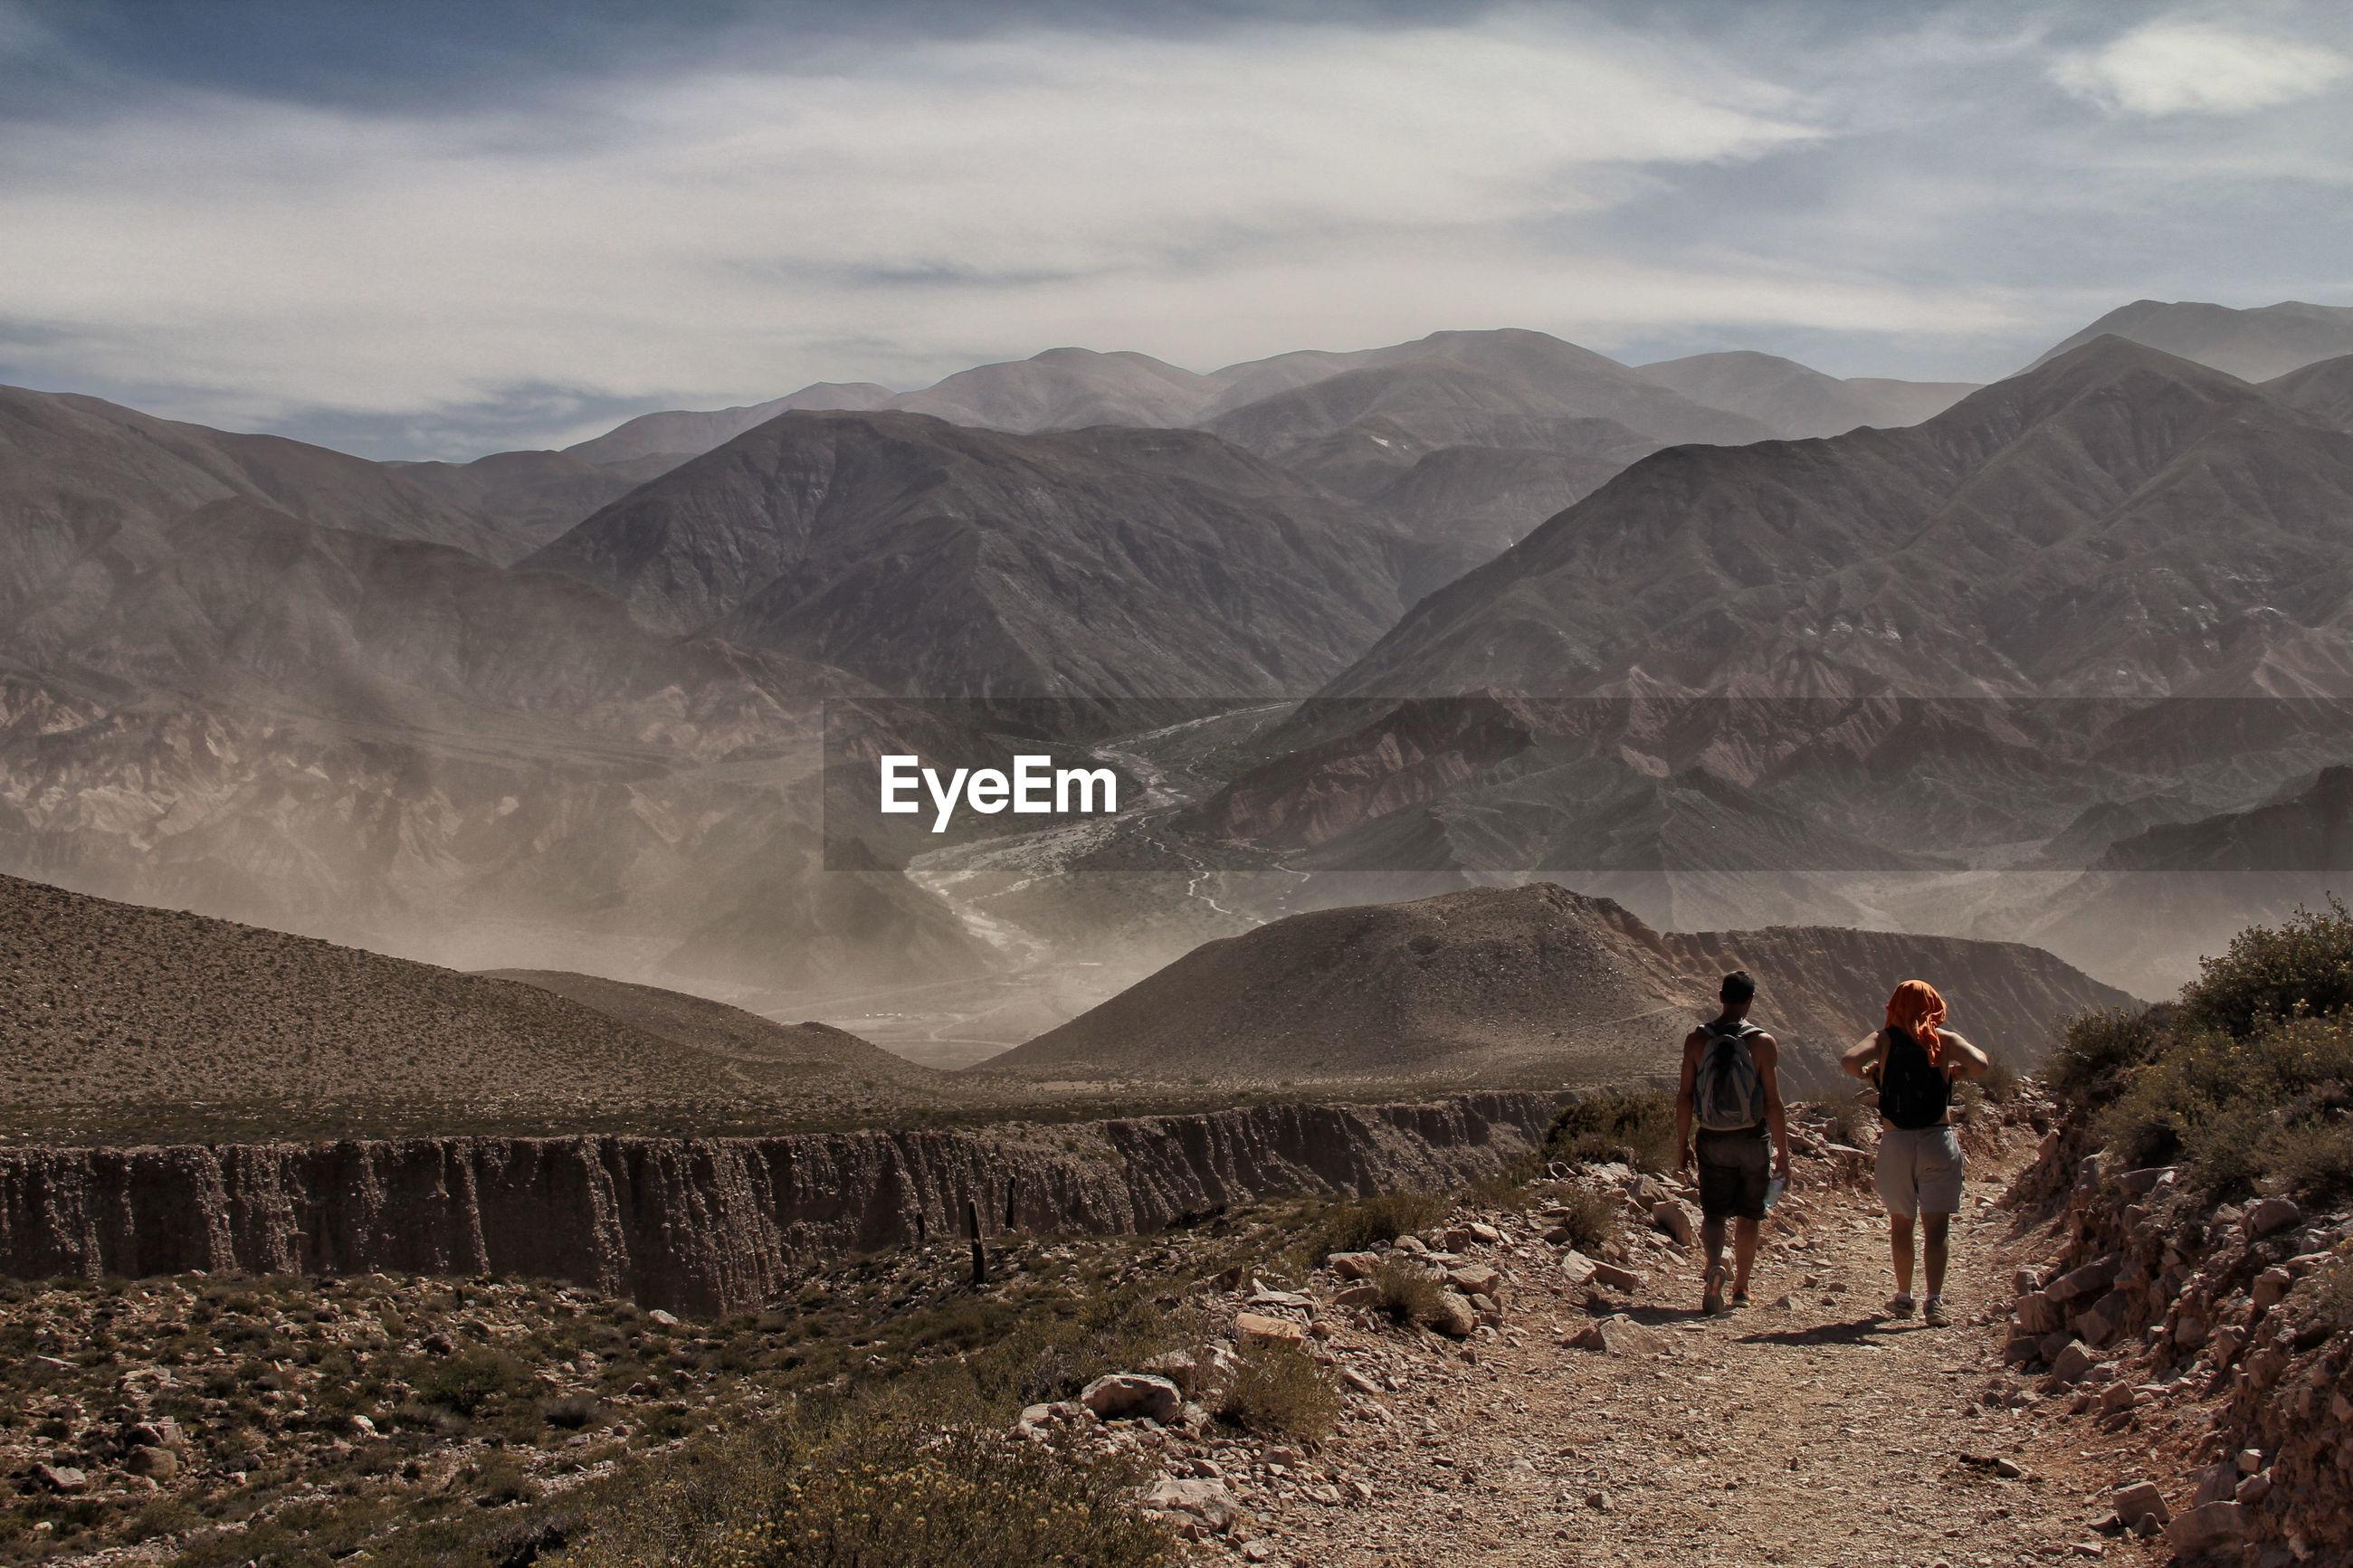 Two people walking on countryside landscape